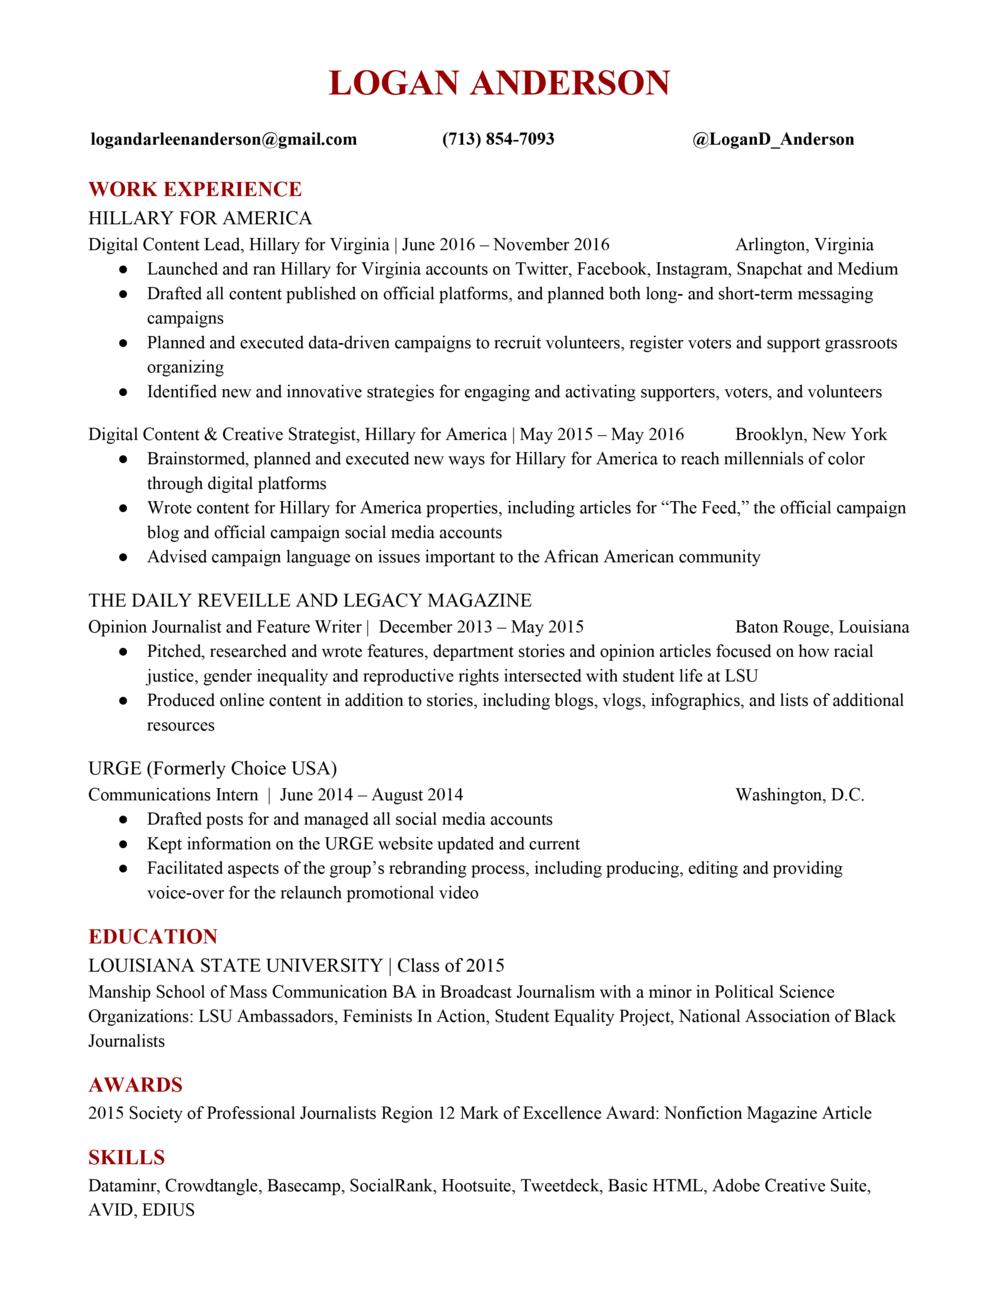 Logan Anderson's Resume